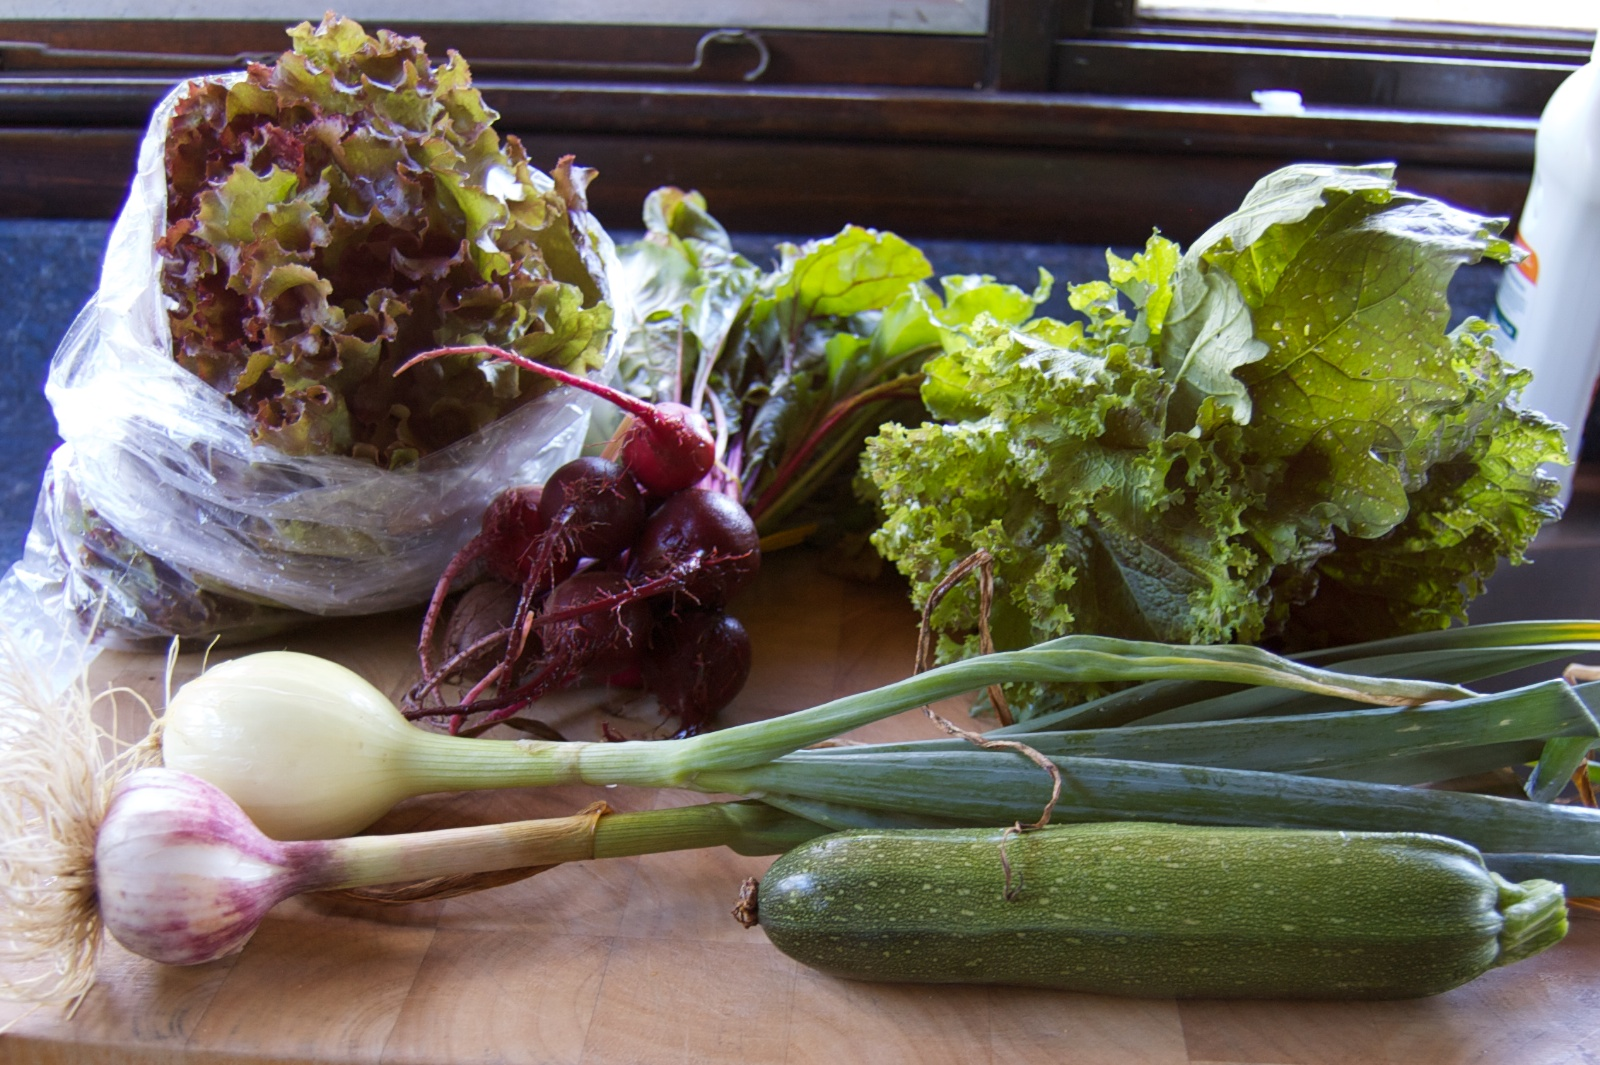 http://blog.rickk.com/food/2012/07/11/csa6.1.jpg